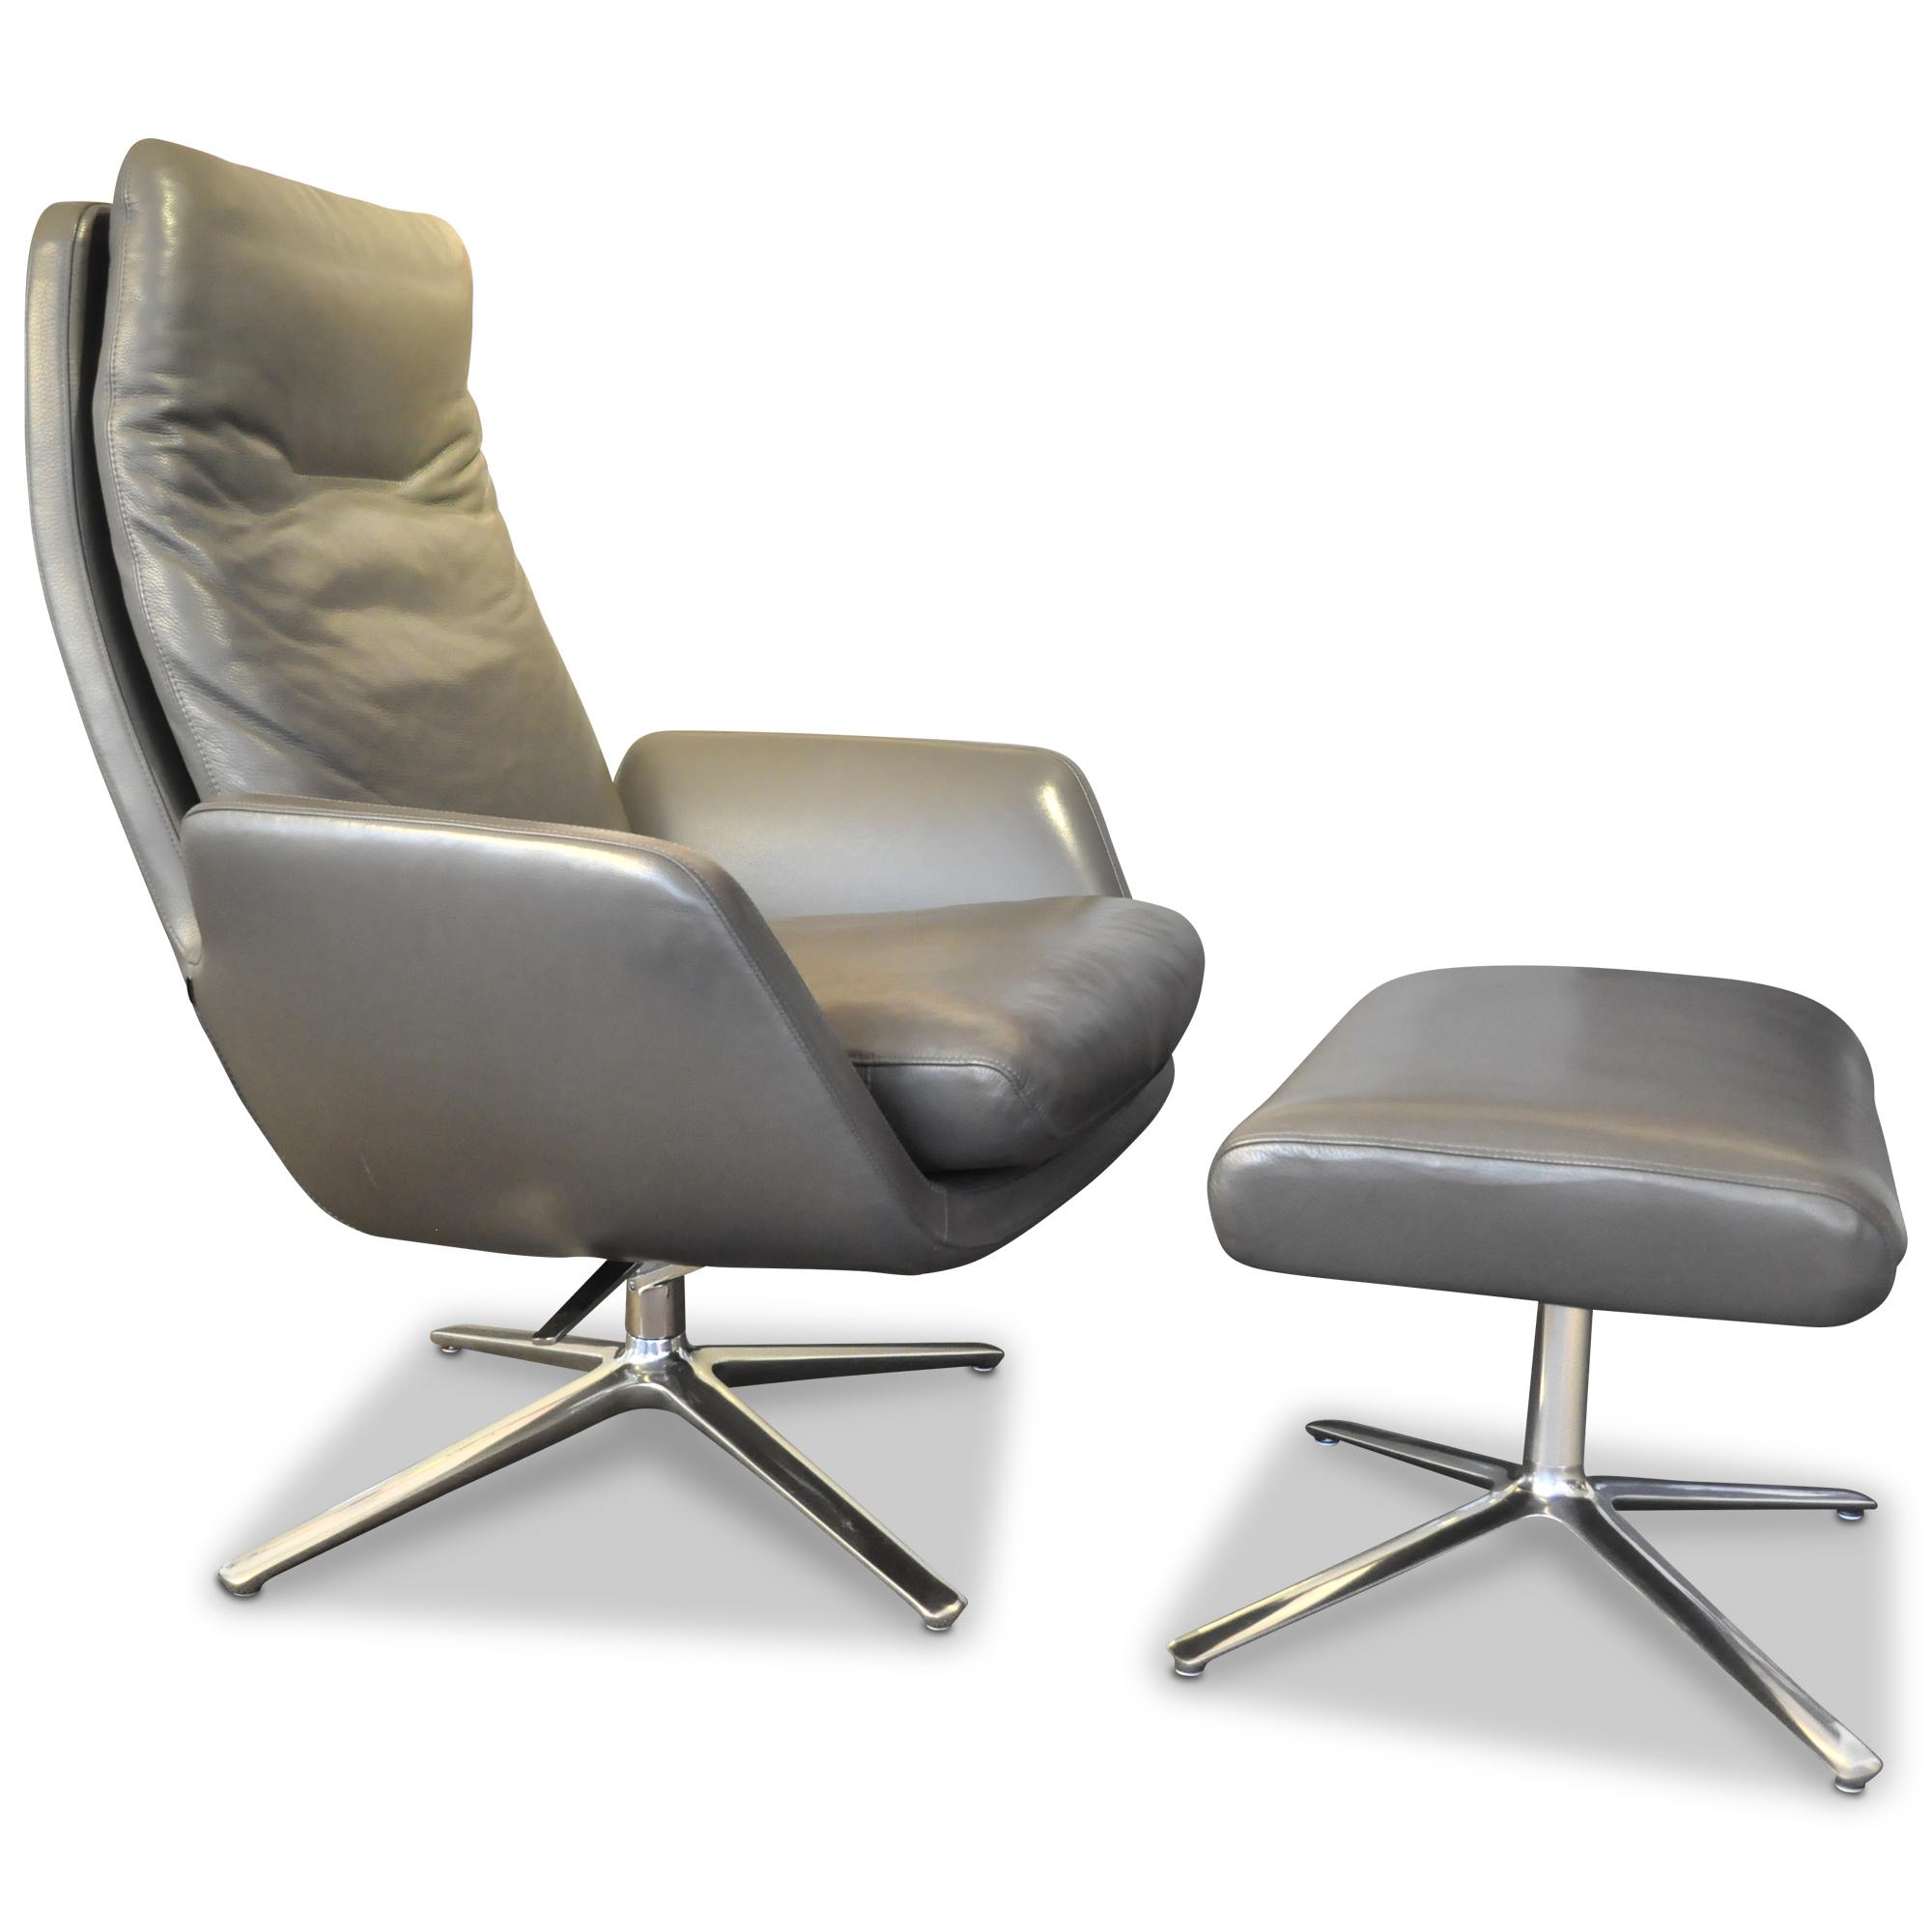 cor sessel, cor designer sessel cordia (mit hocker) leder aluminium braun grau, Design ideen